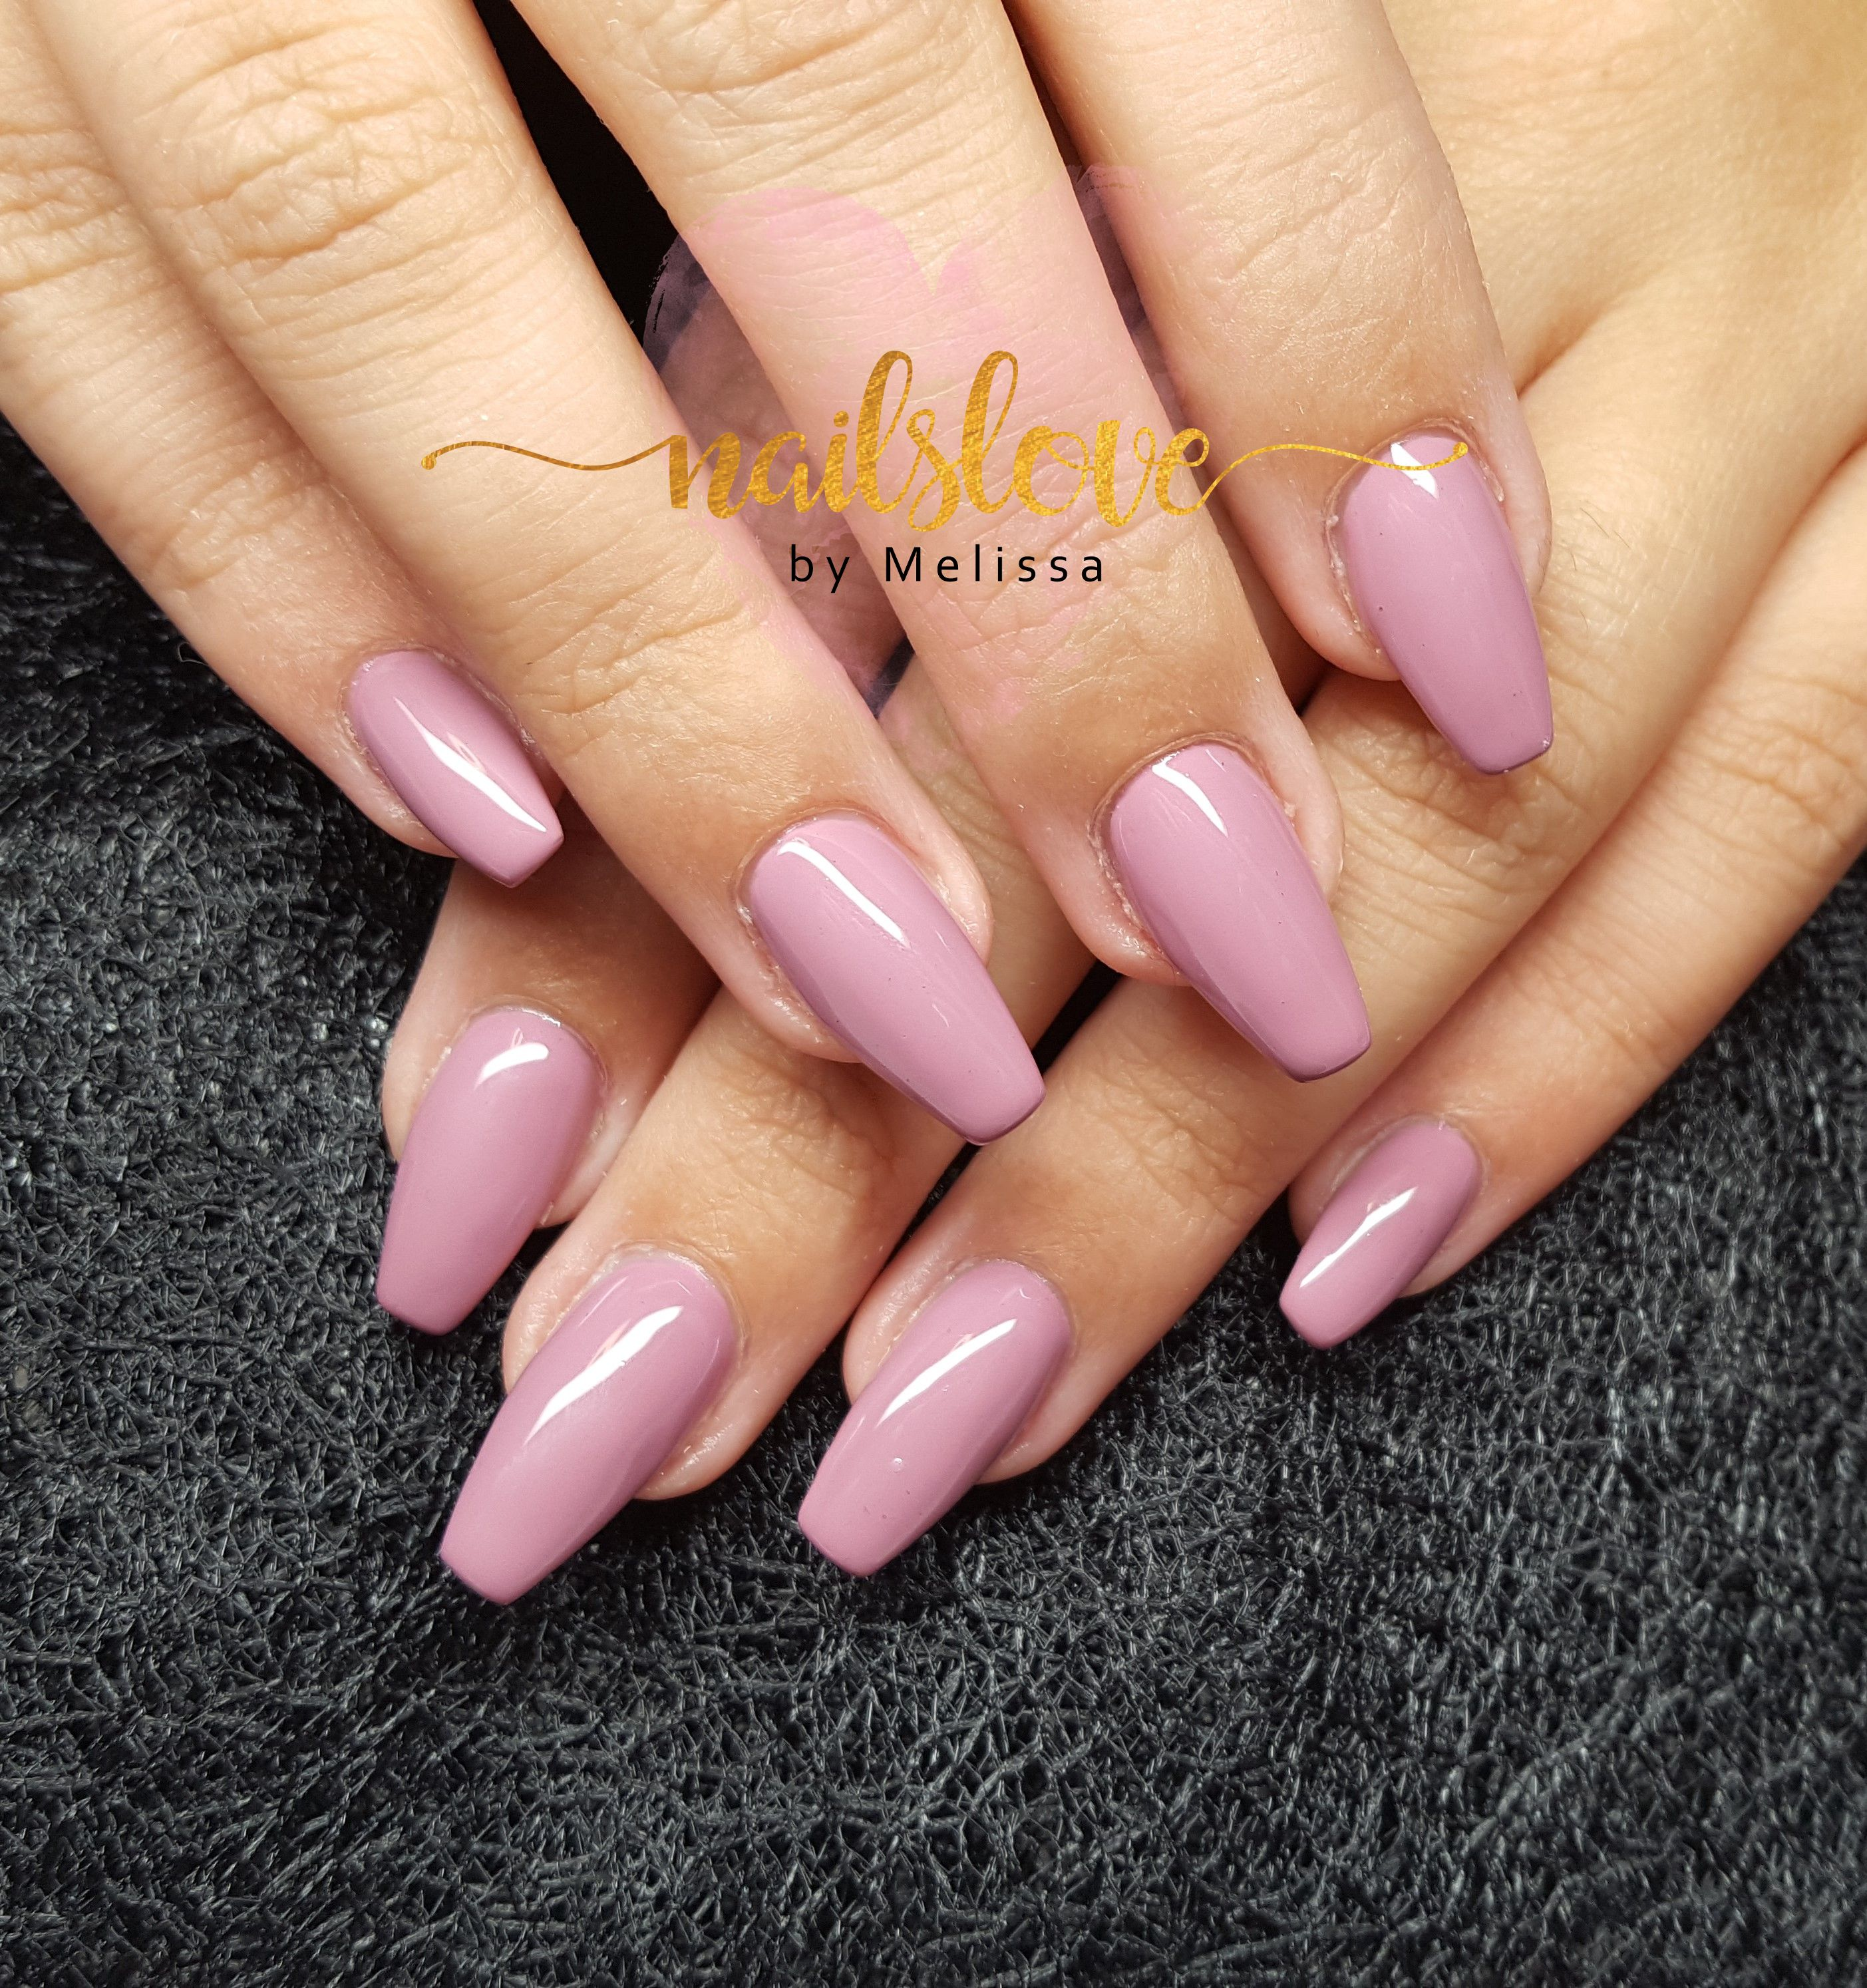 Ballerinanails Fullcovernails Nails Acrylicnails